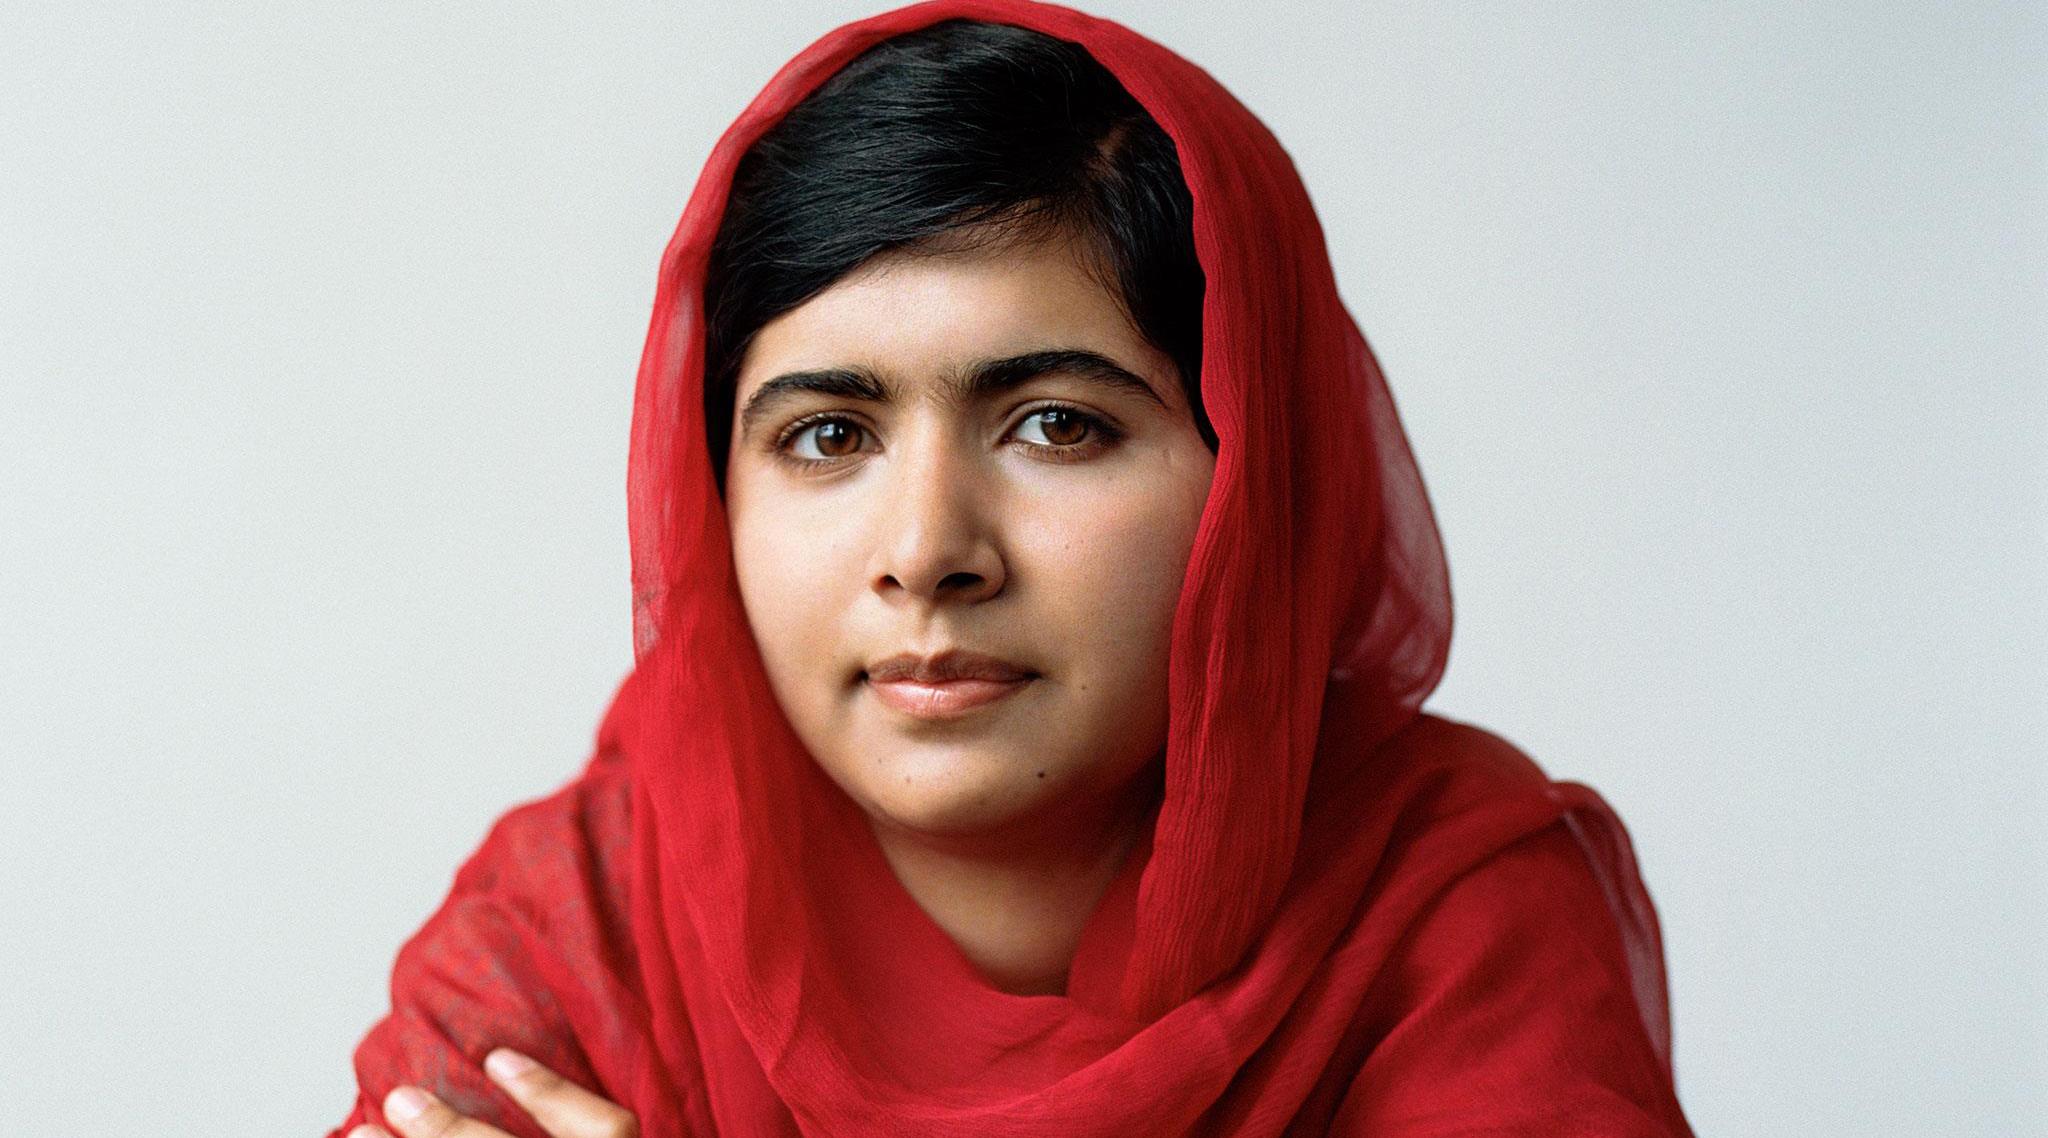 Ativista Malala Yousafzai realiza palestra em São Paulo